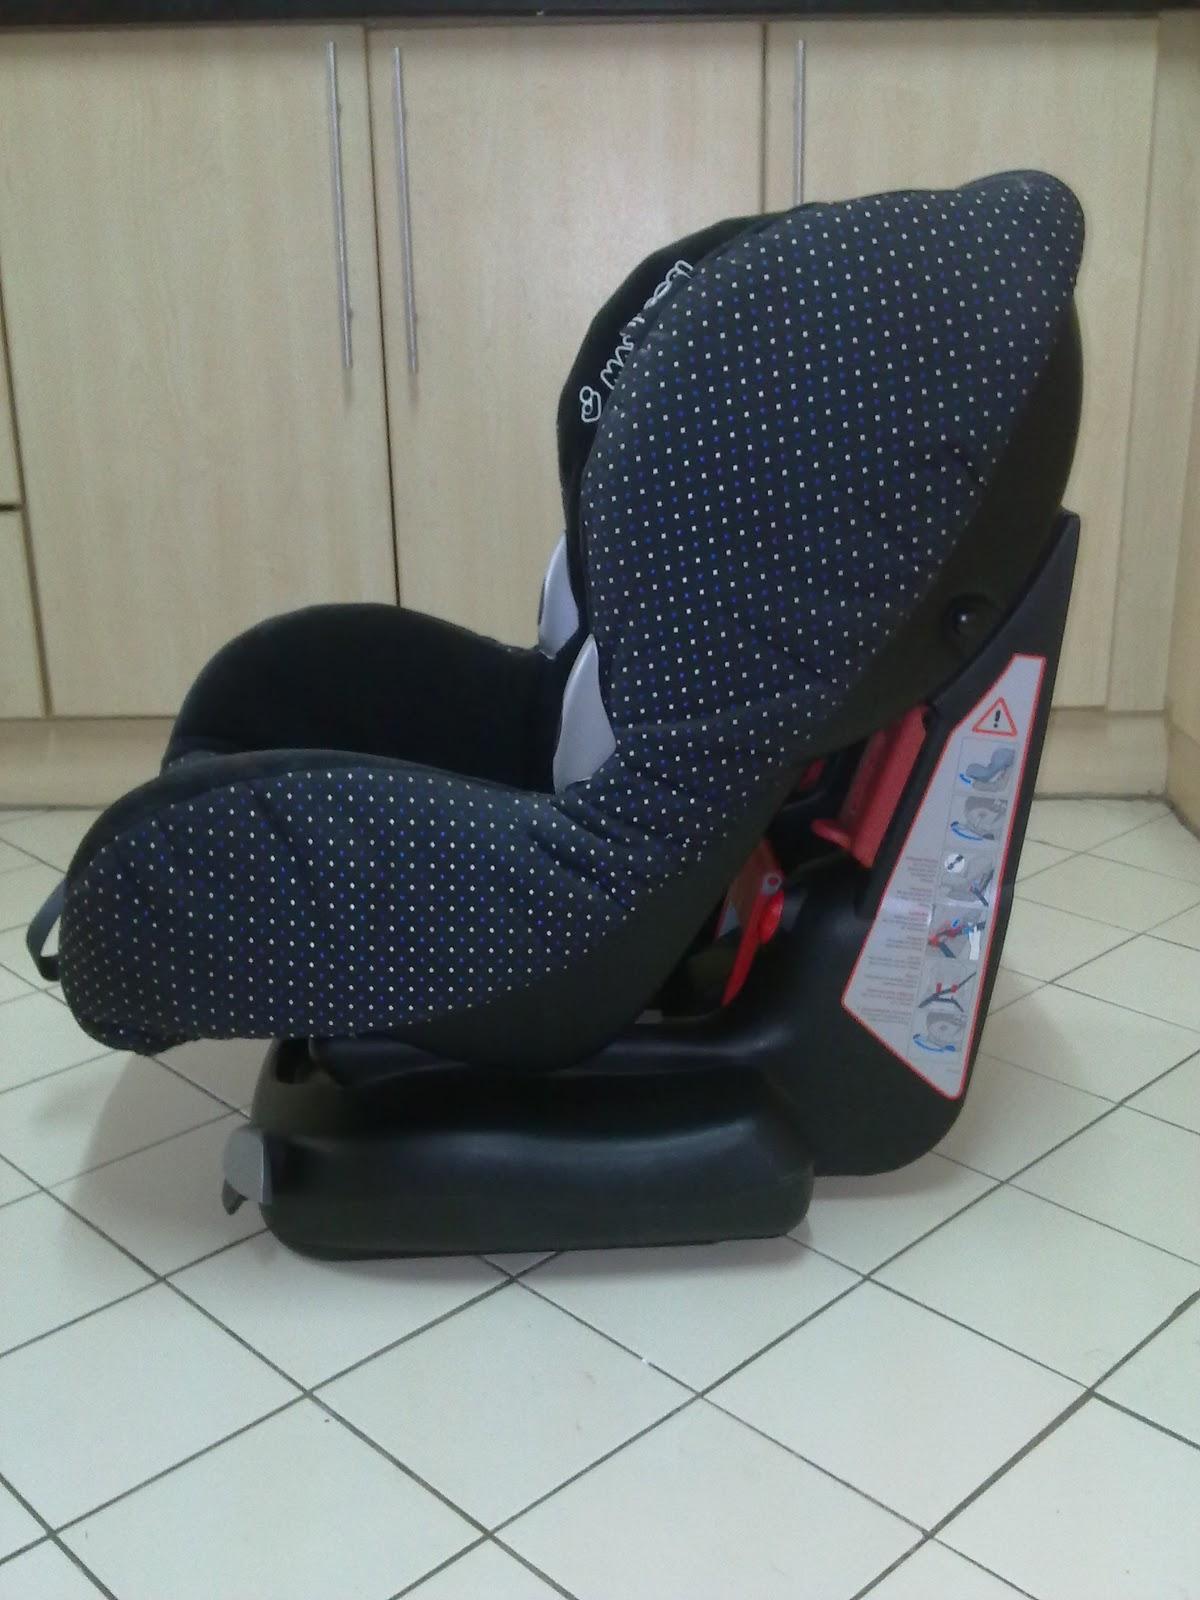 twinklebibi car seat maxi cosi priori xp. Black Bedroom Furniture Sets. Home Design Ideas